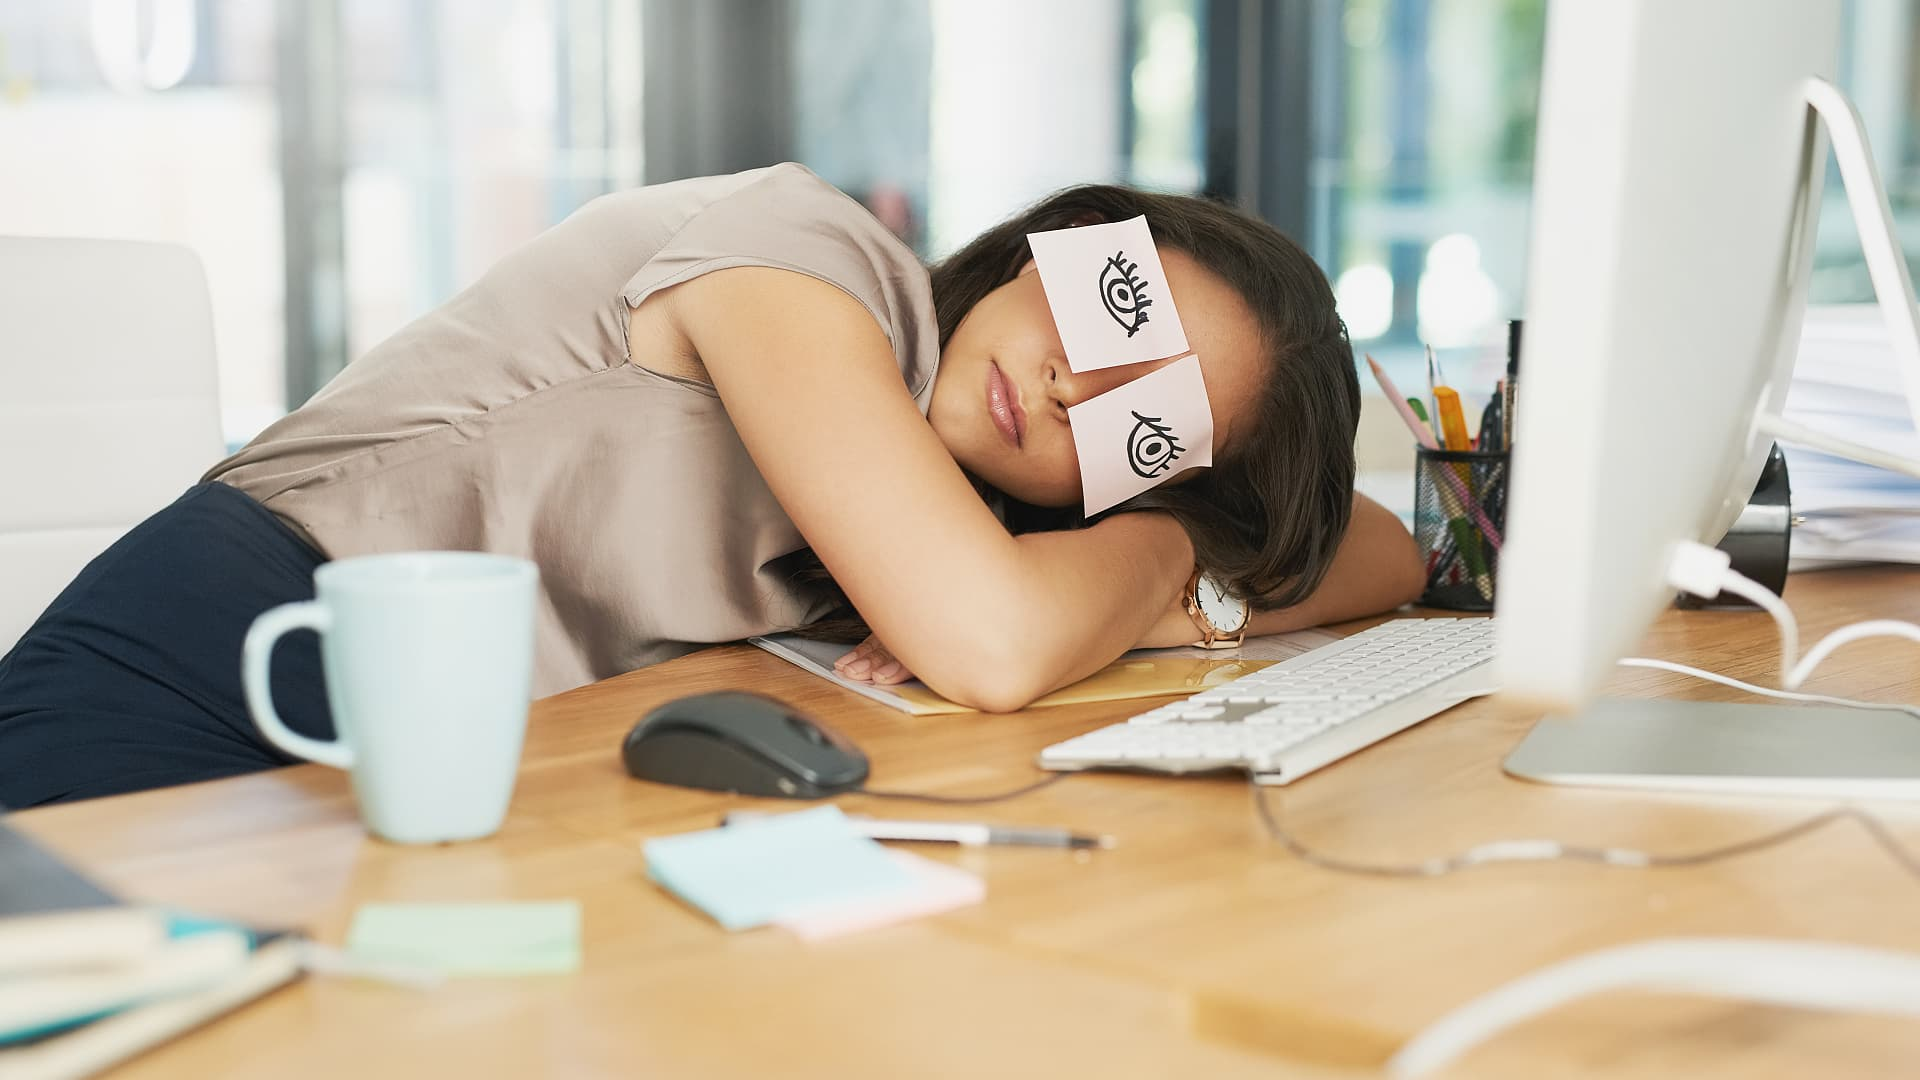 Научно доказано: скука вгоняет в сон